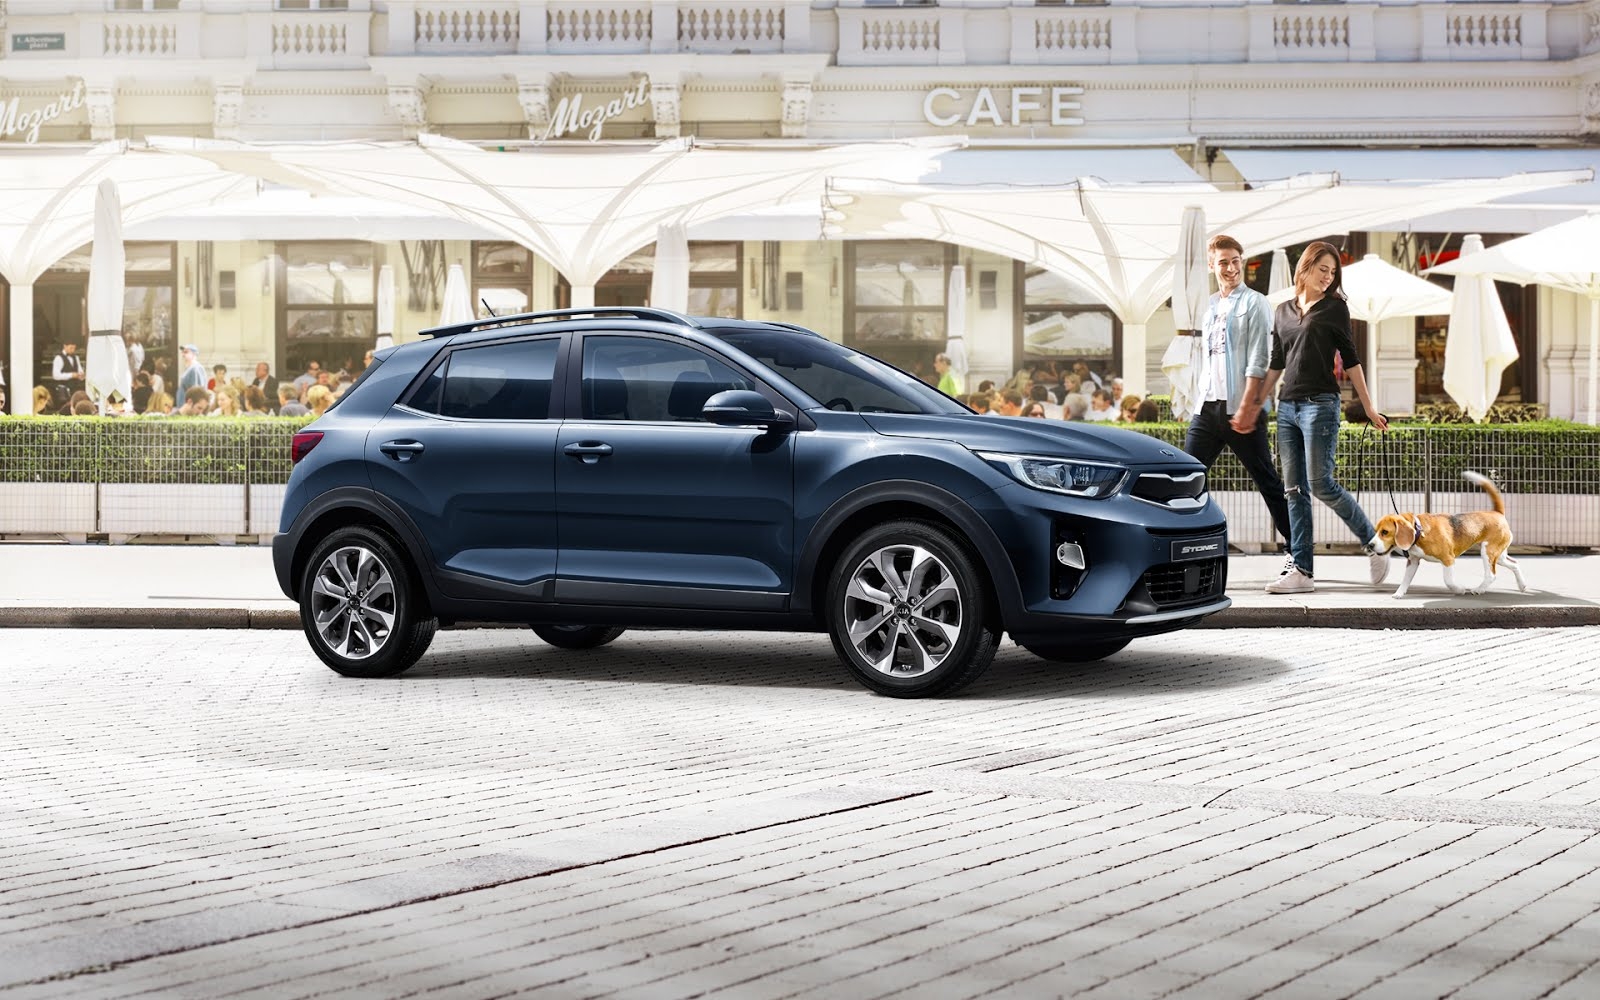 Hyundai Kona Kia Stonic >> Leopaul's blog: Kia Stonic